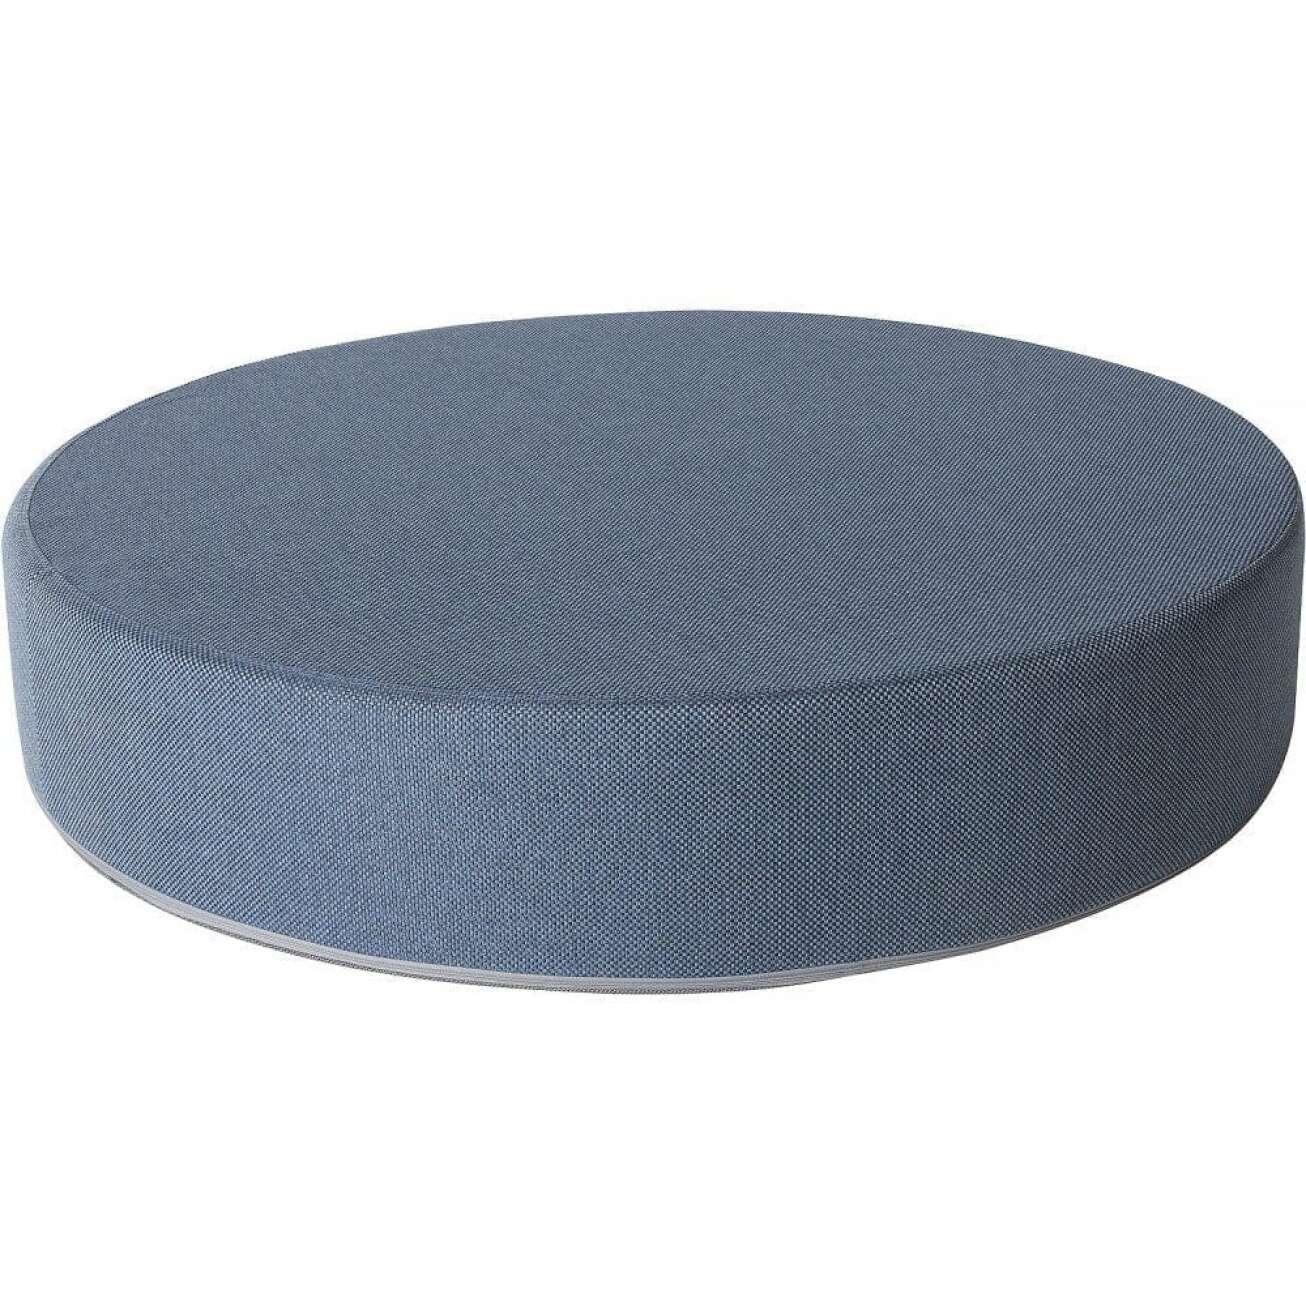 Sundays puff mama i blå farge, diameter 80 cm